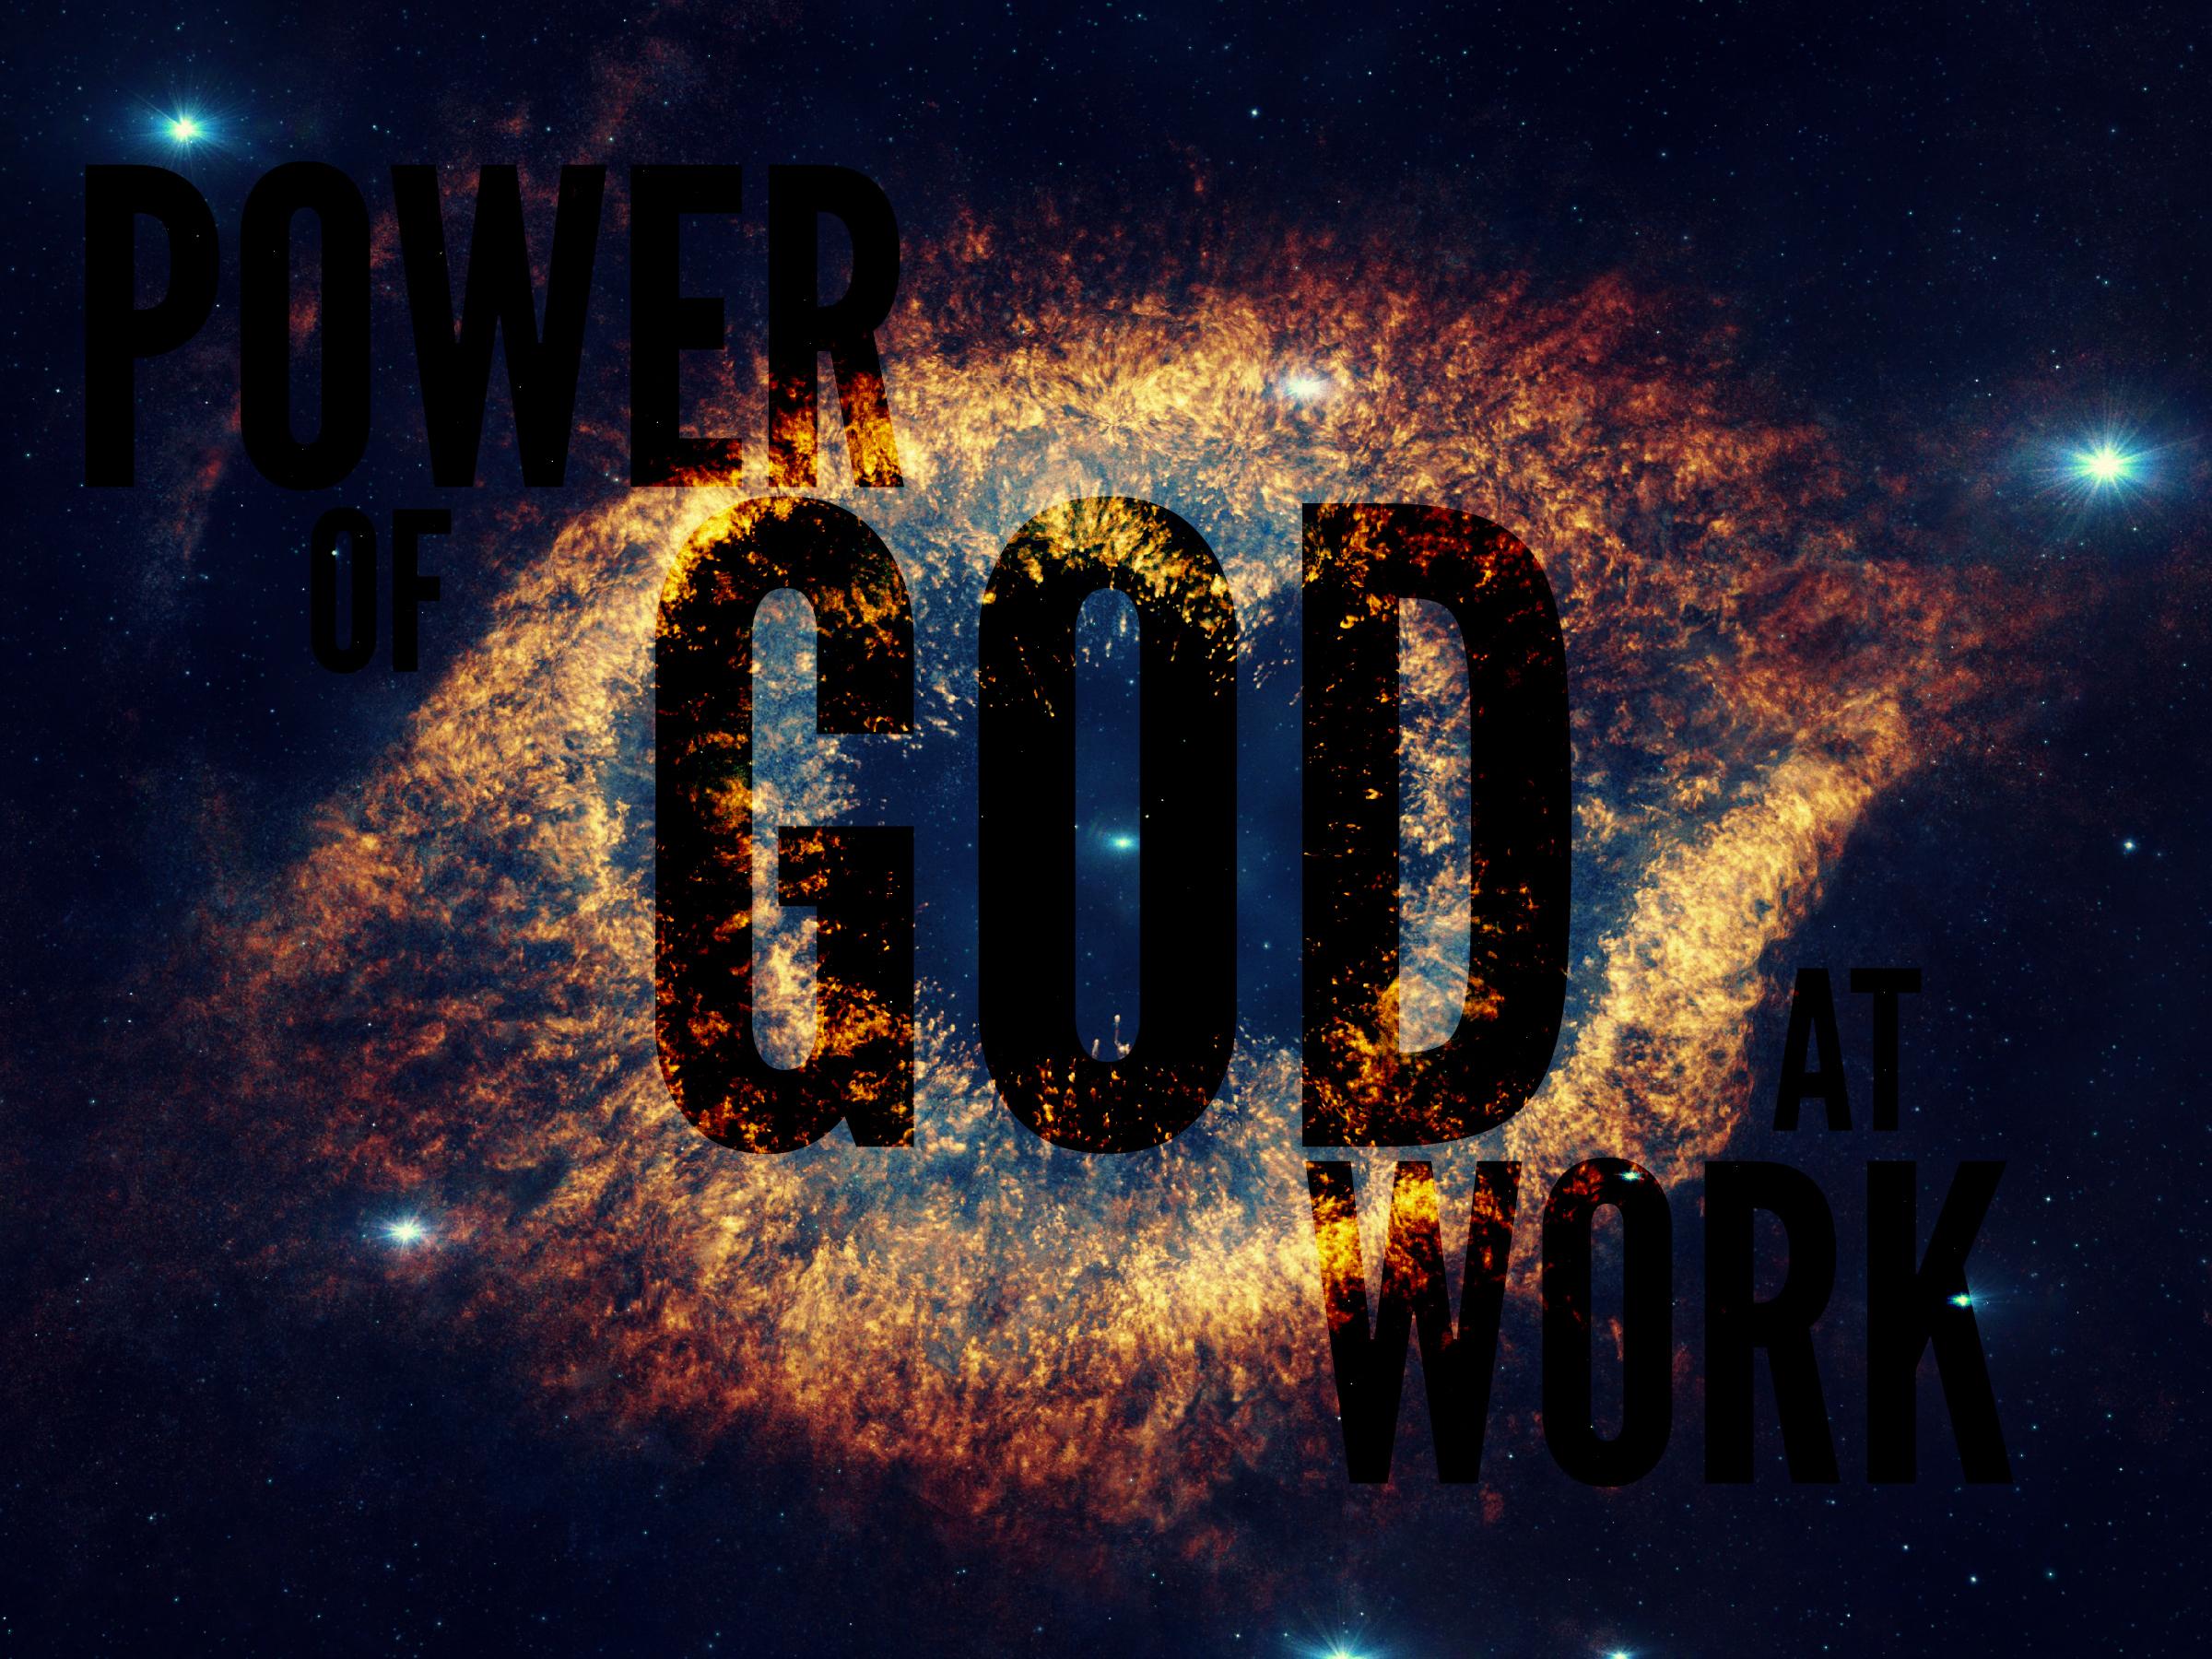 Power Of God : The power of god river walk